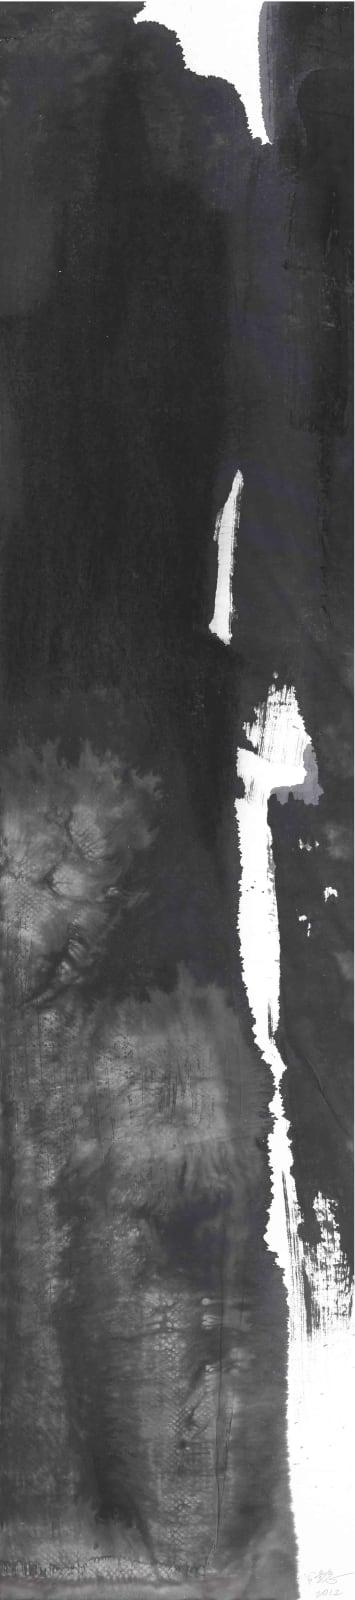 Wang Gongyi 王公懿, Minimalistic Landscape 極簡山水, 2012